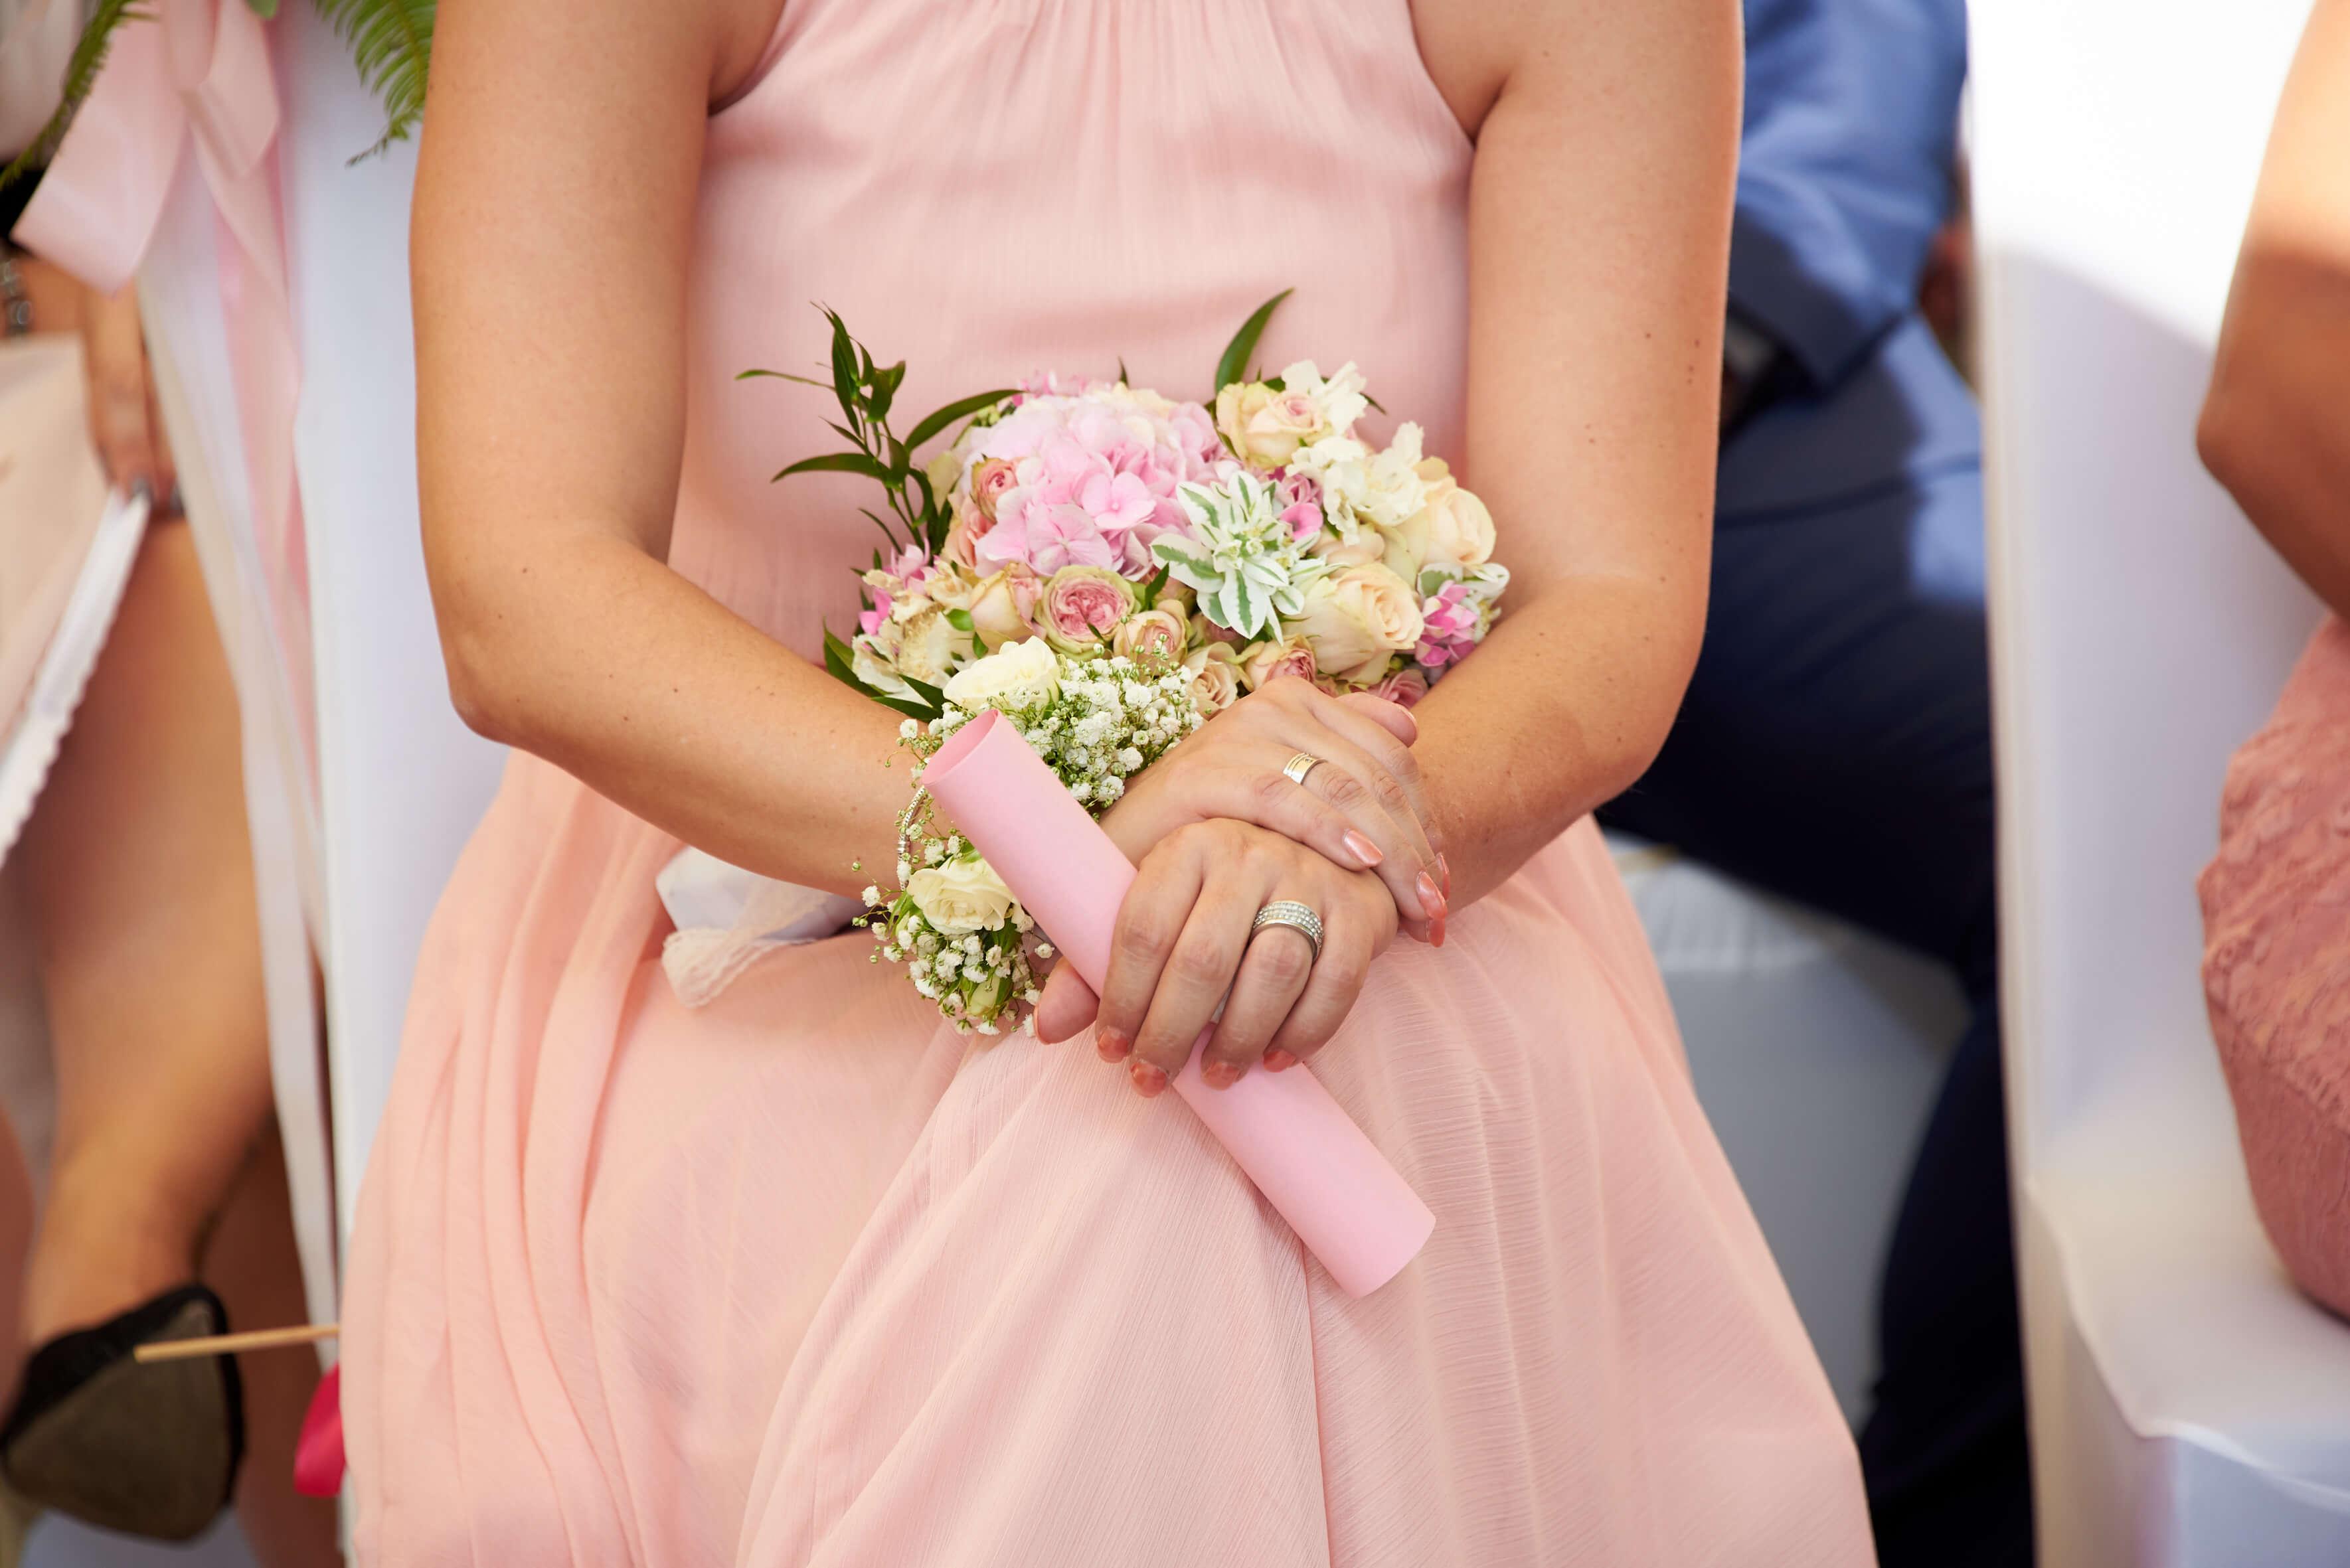 Strauß Brautjungfer